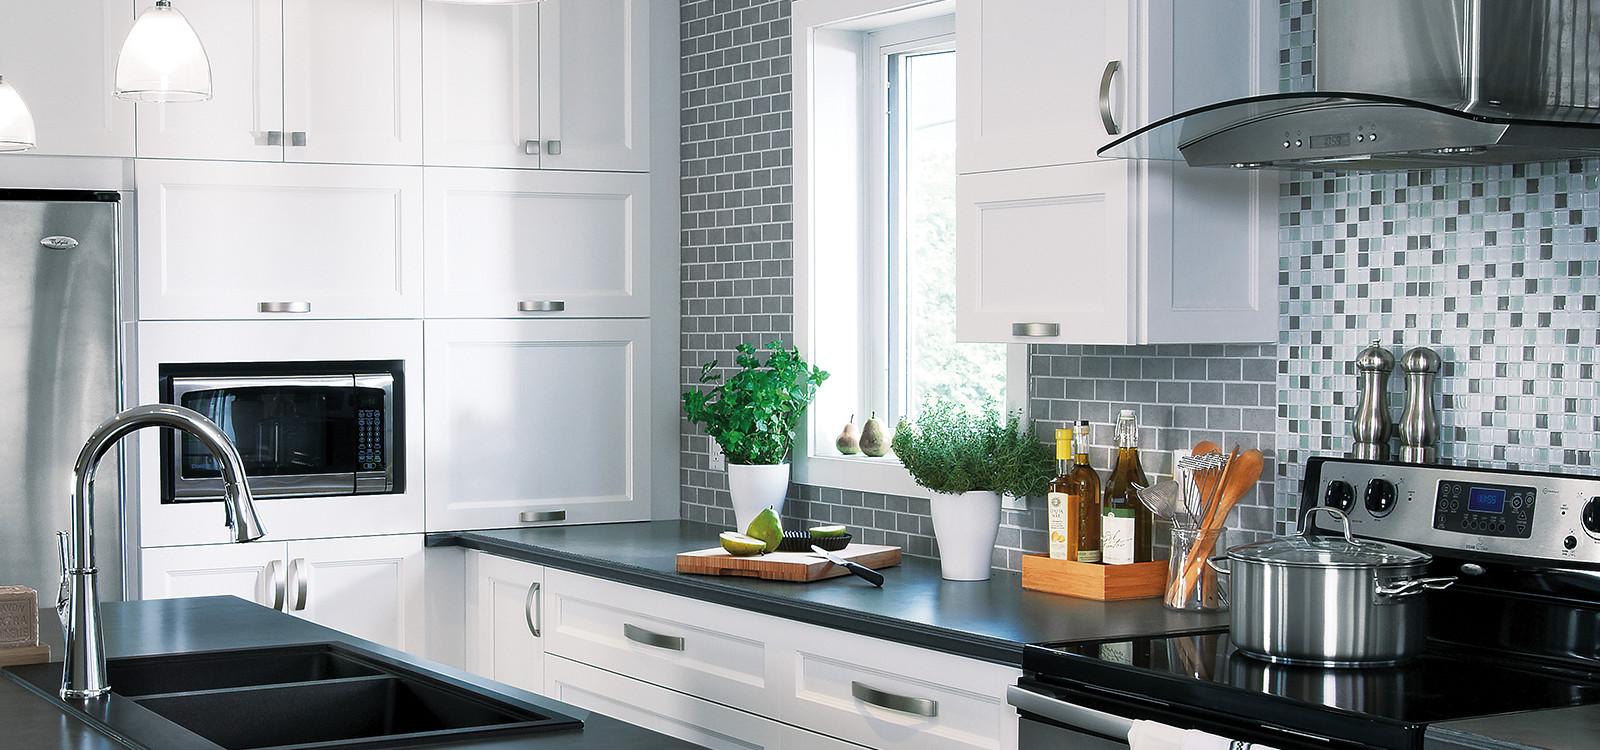 rona kitchen cabinet hardware cabinets matttroy. Black Bedroom Furniture Sets. Home Design Ideas